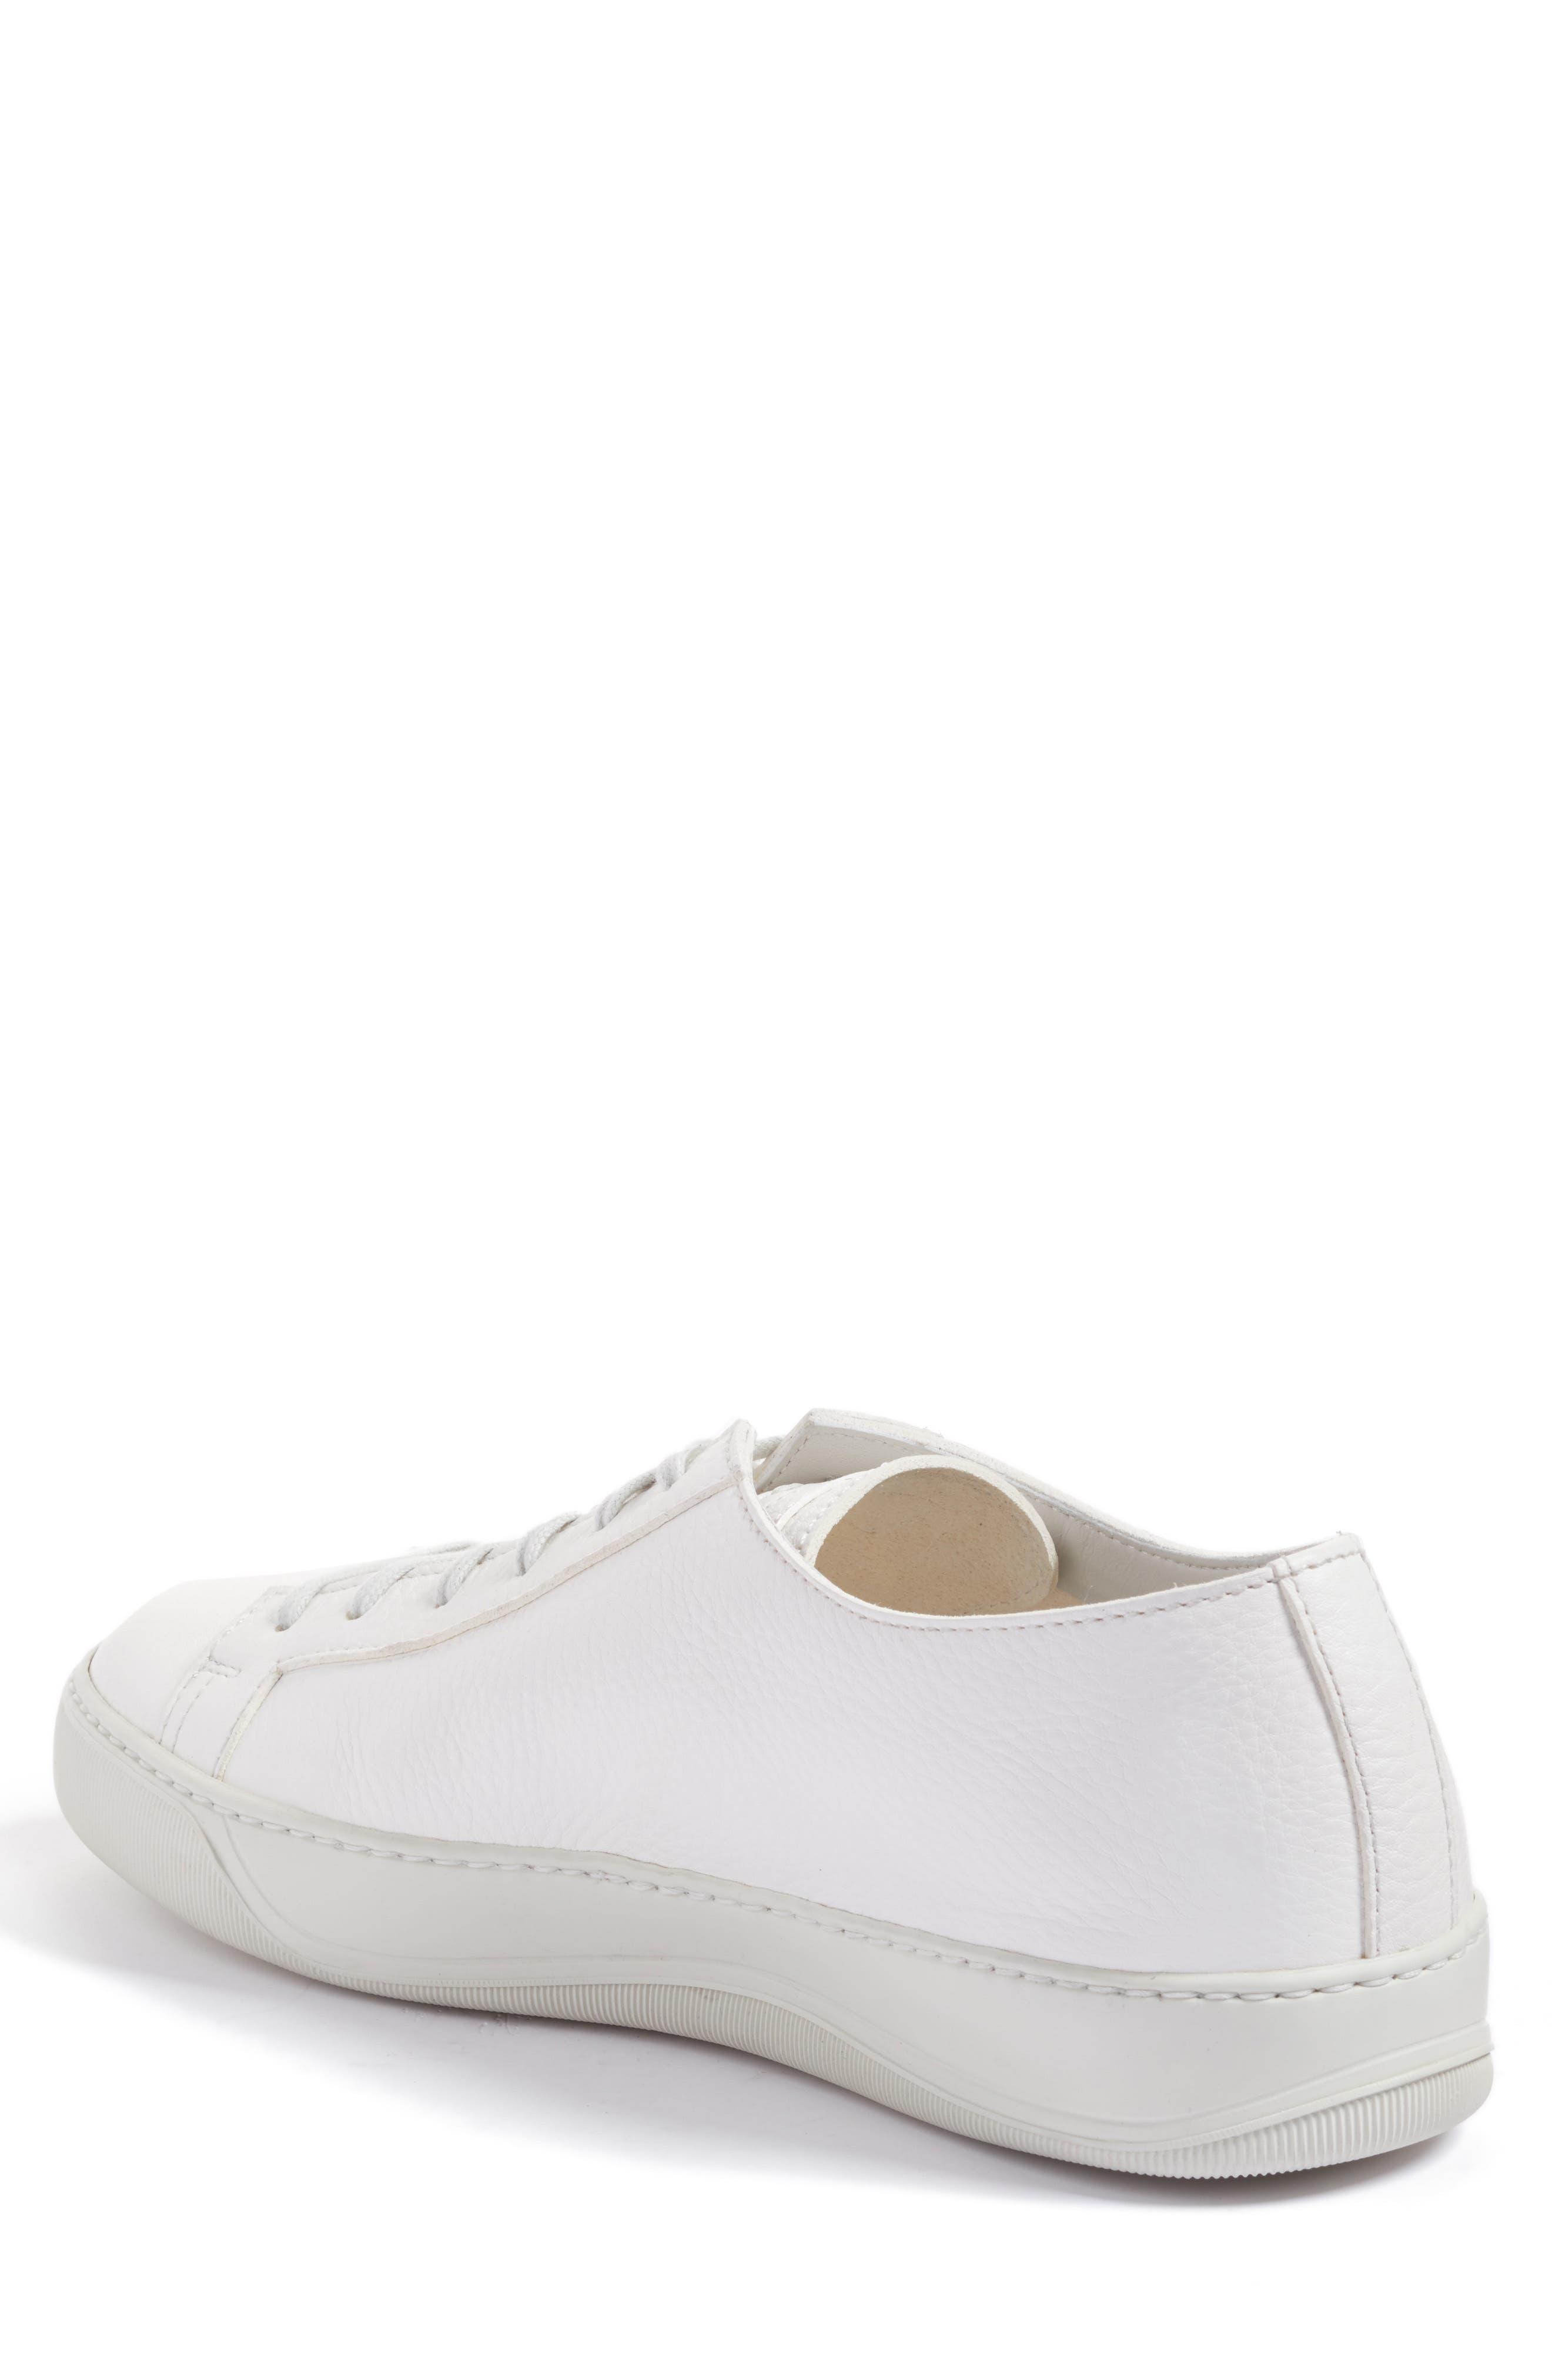 Cleanic Sneaker,                             Alternate thumbnail 7, color,